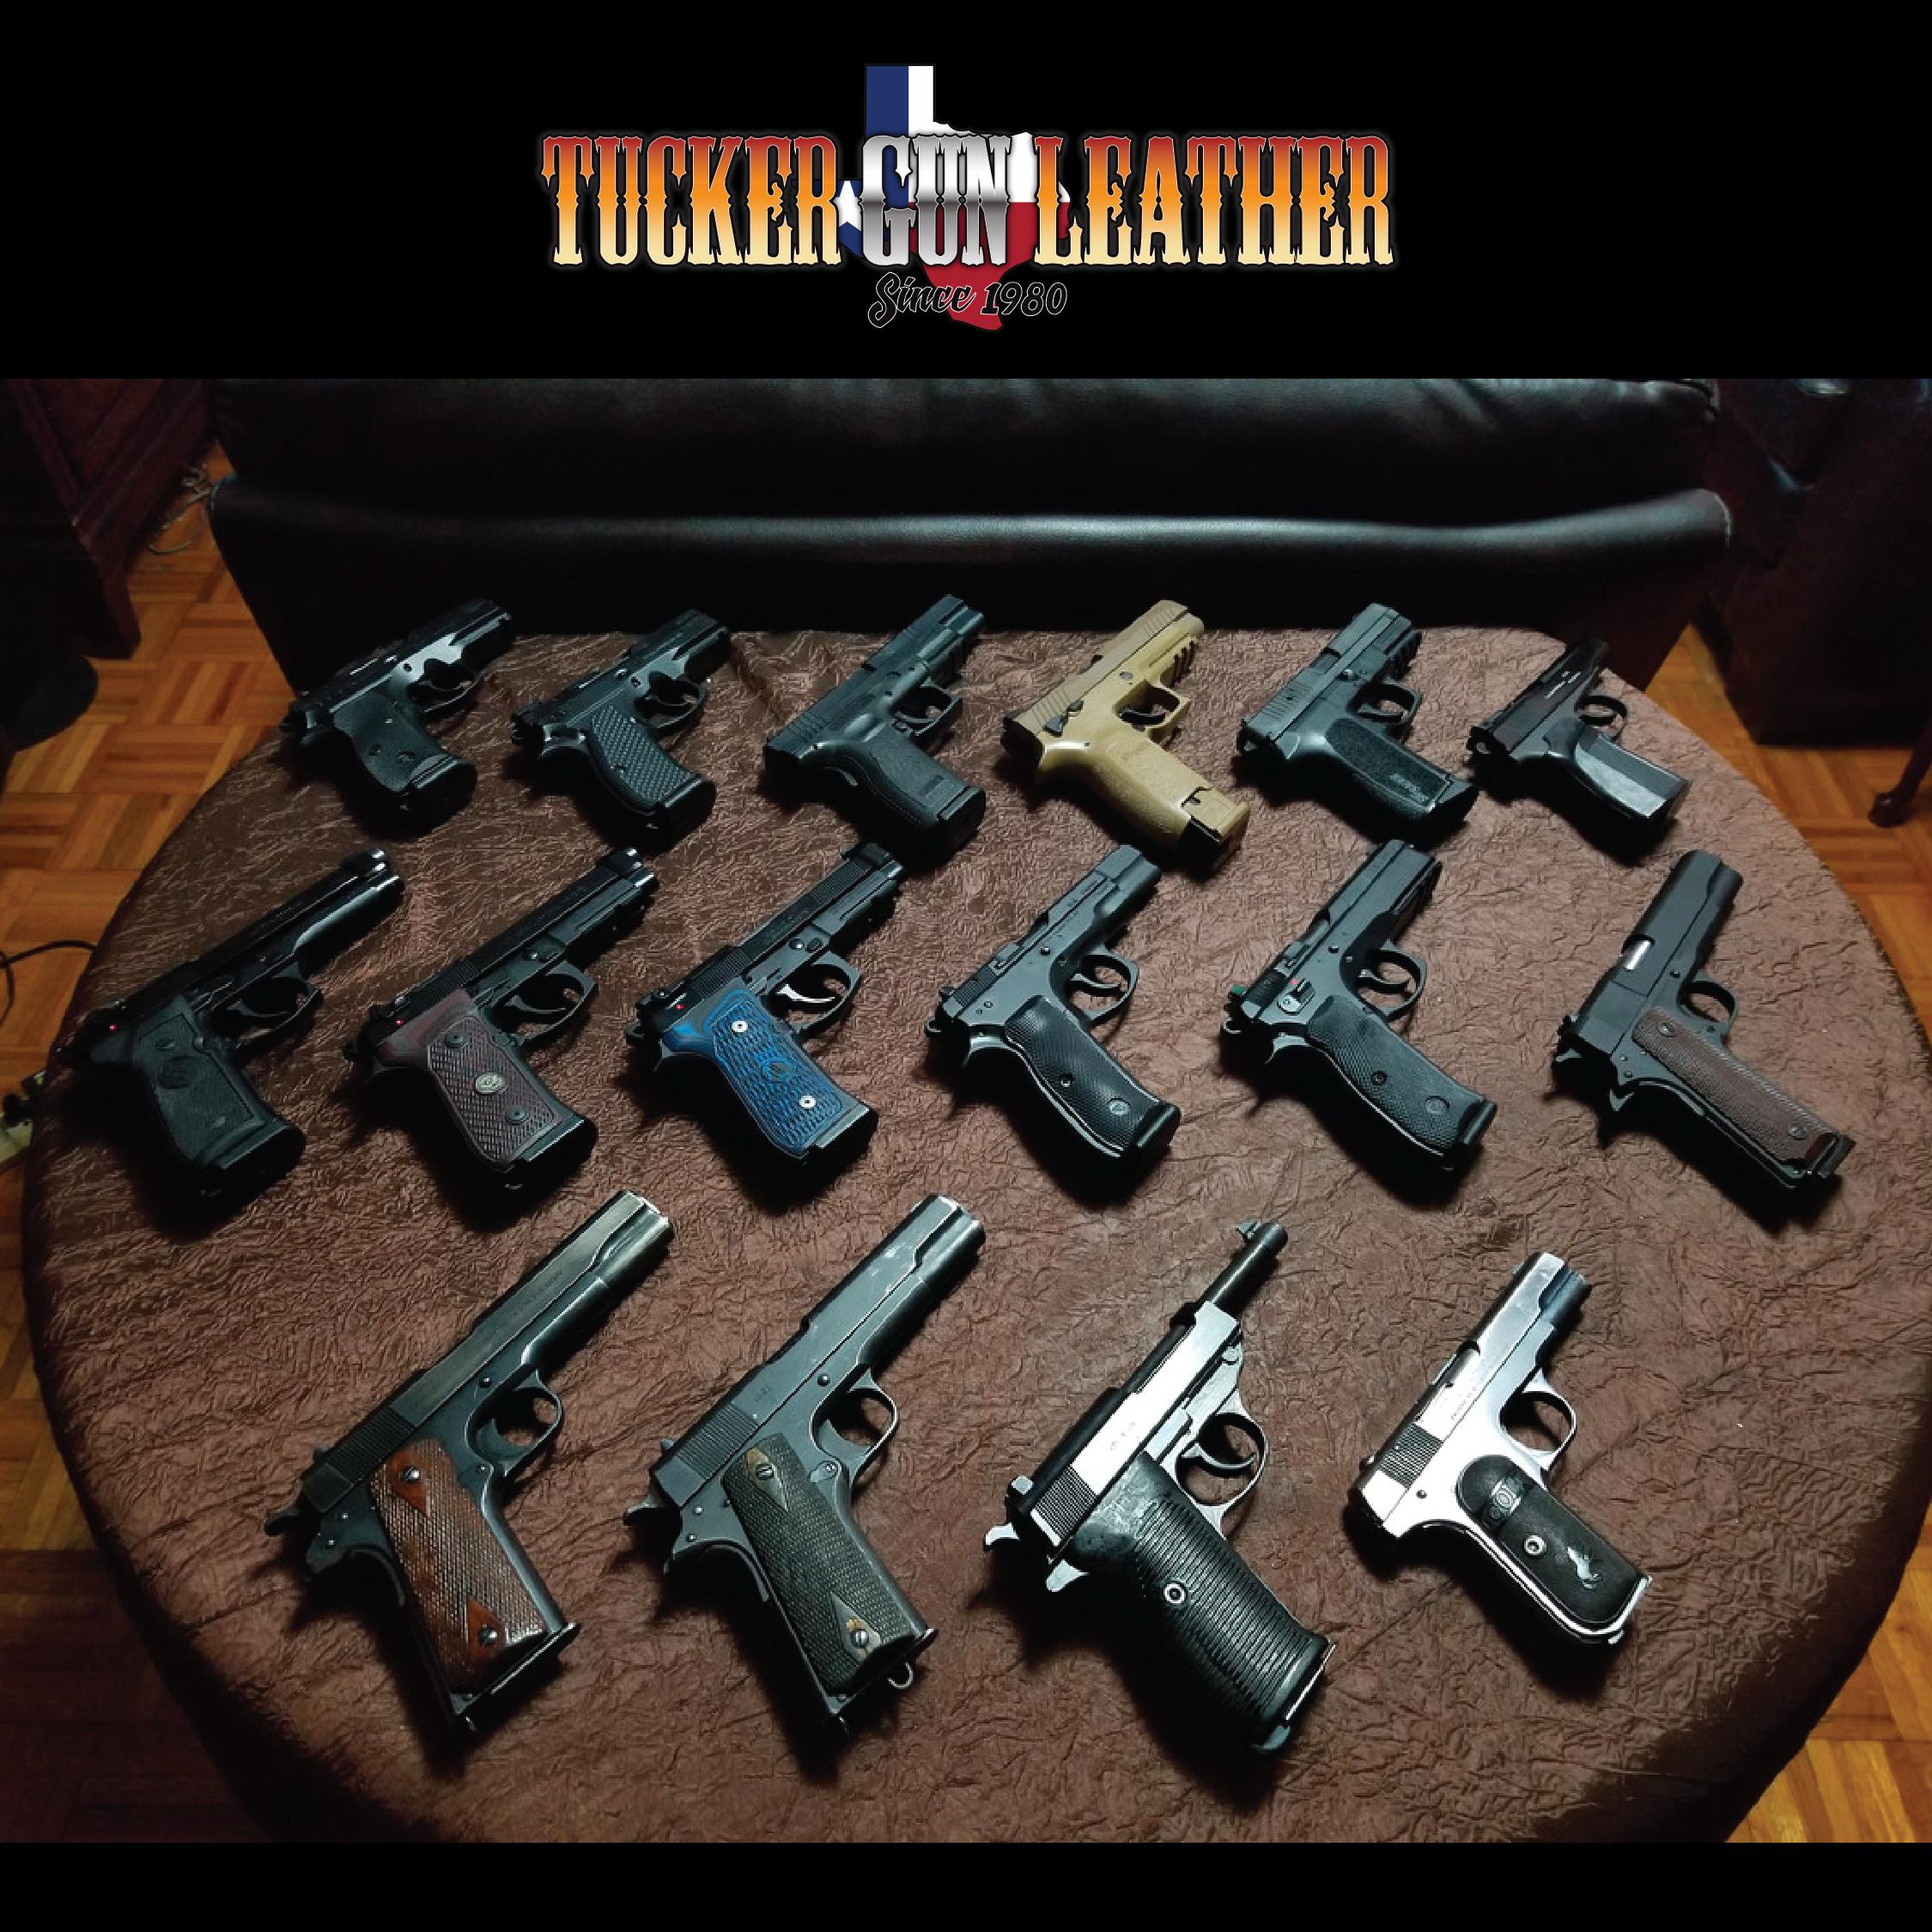 Handguns Top Choice For Self Defense Says Study